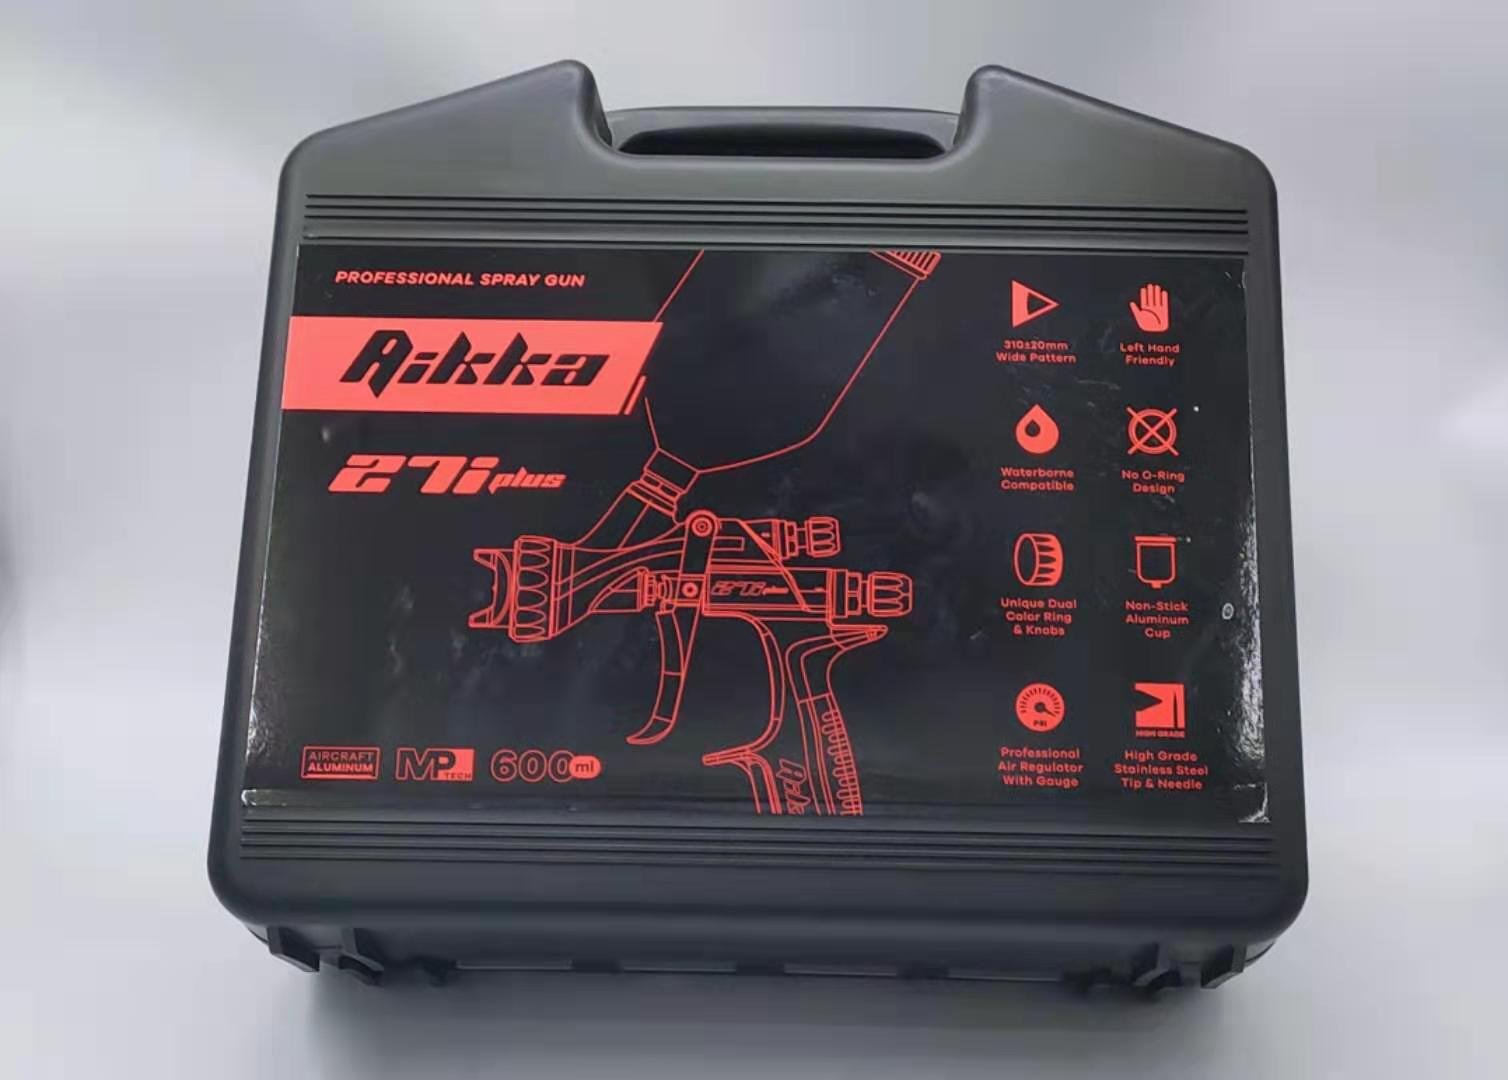 Aikka 27i Plus Gravity Spray Gun 1.4mm